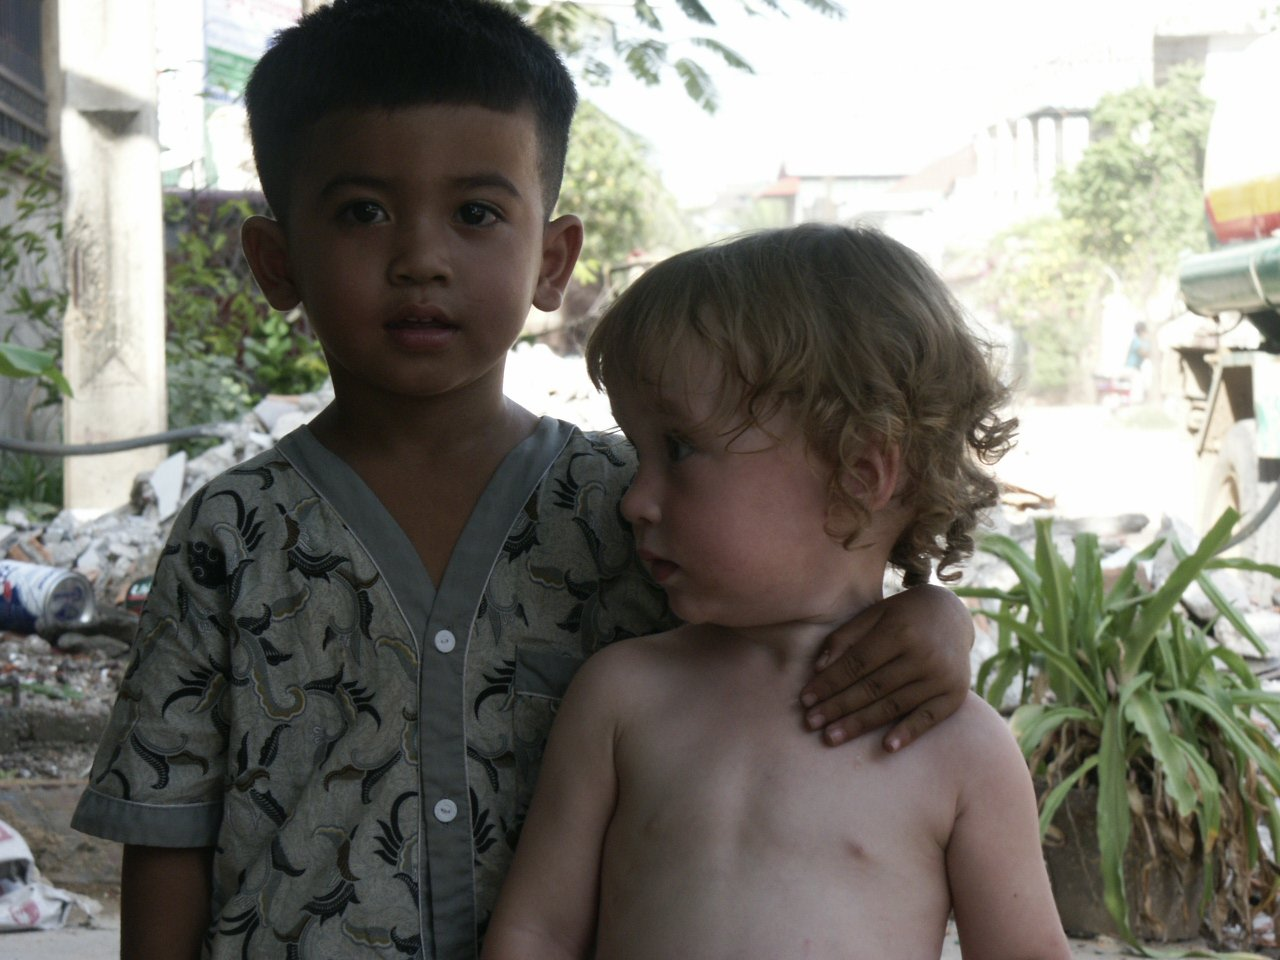 boy&girl,cambodia,outdoors,people